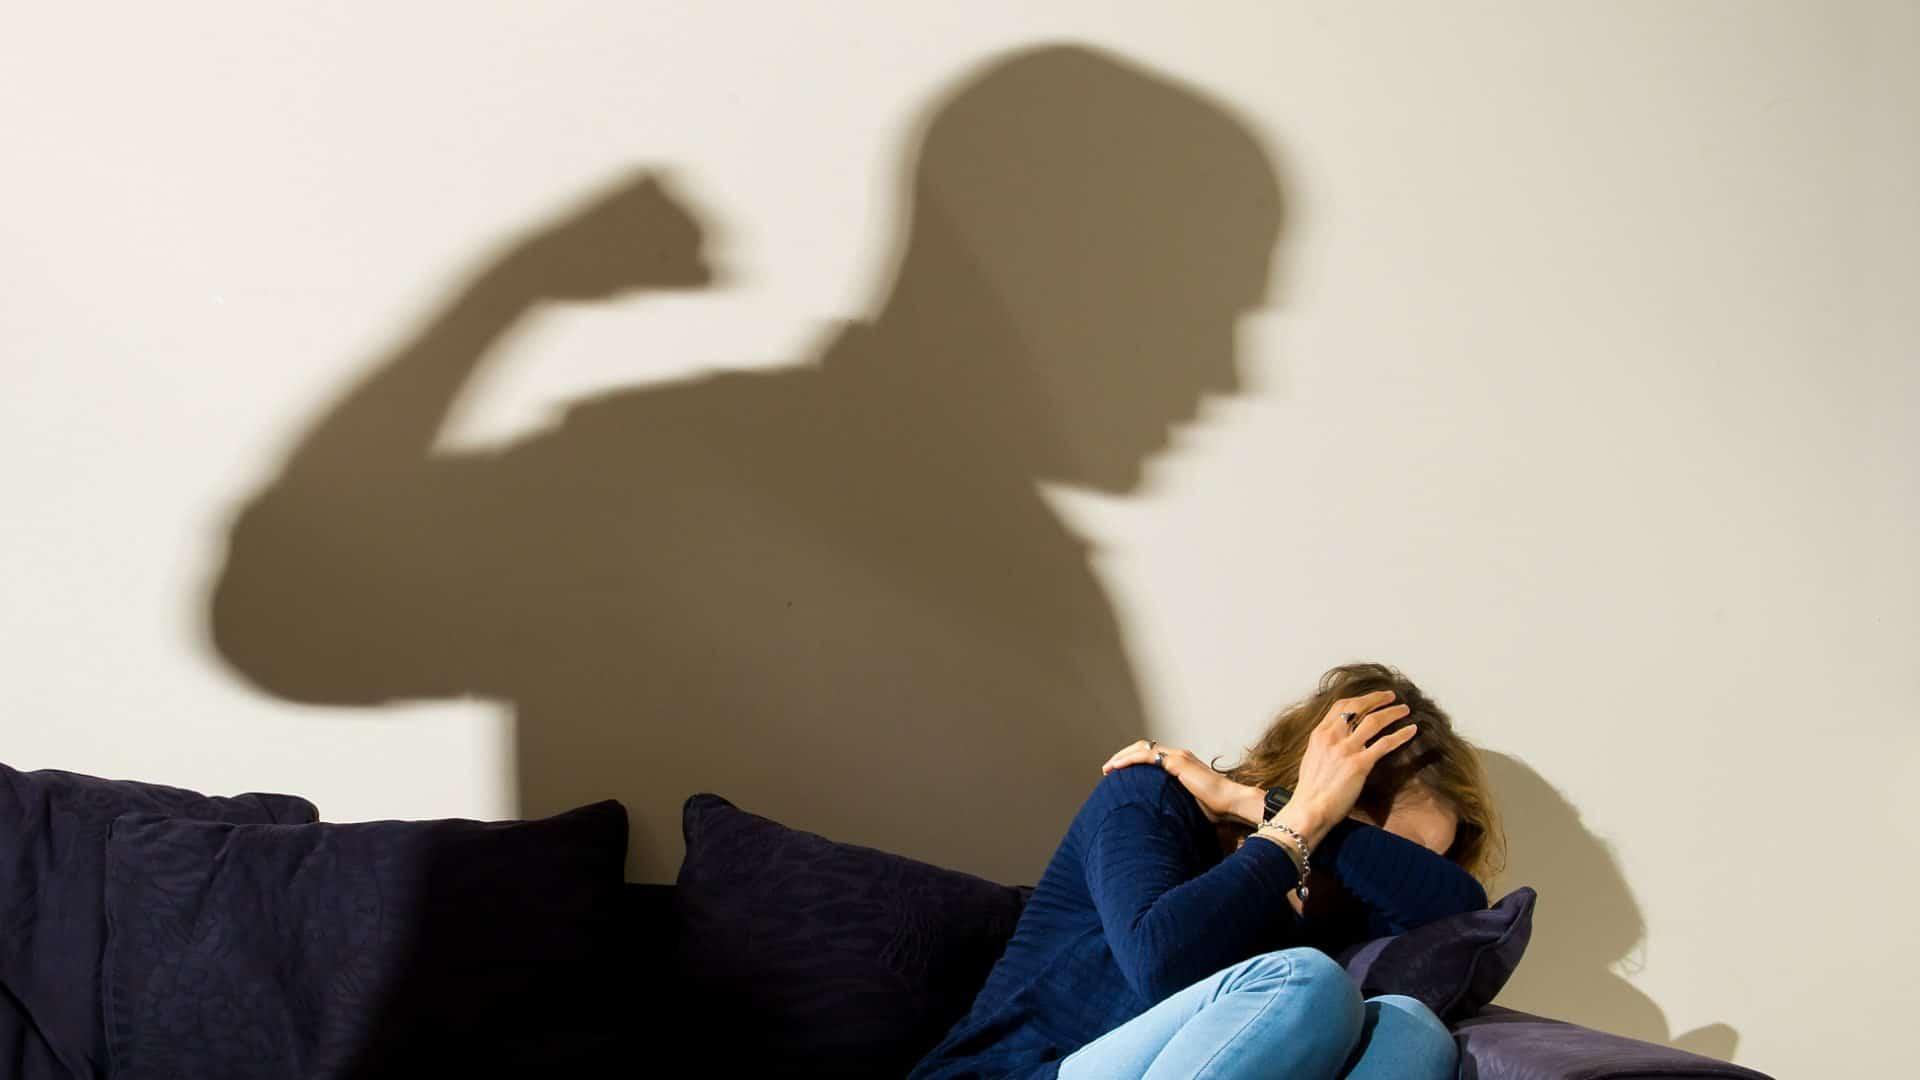 рукоприкладство со стороны супруга